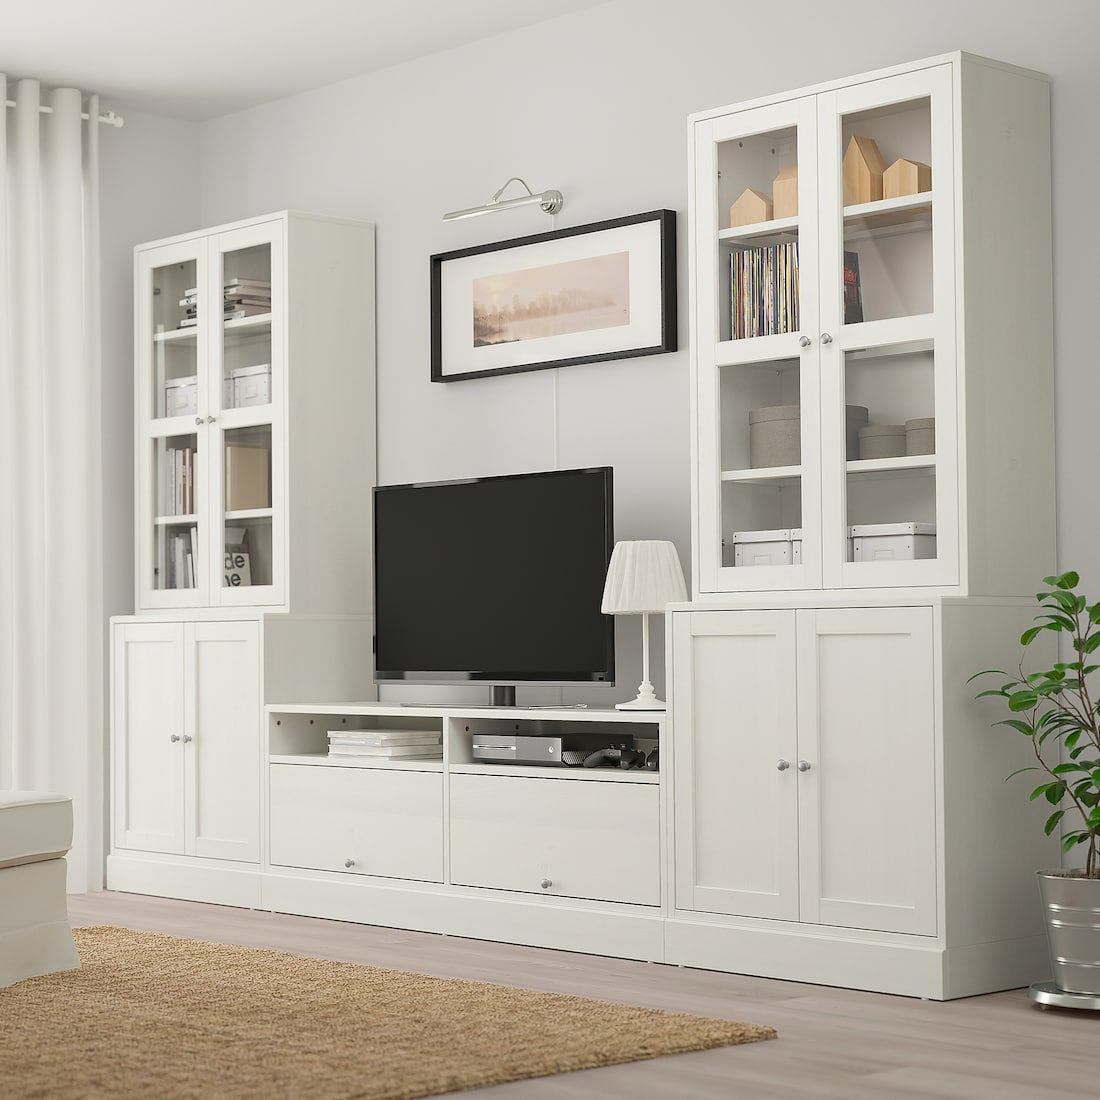 HAVSTA TV storage combinationglass